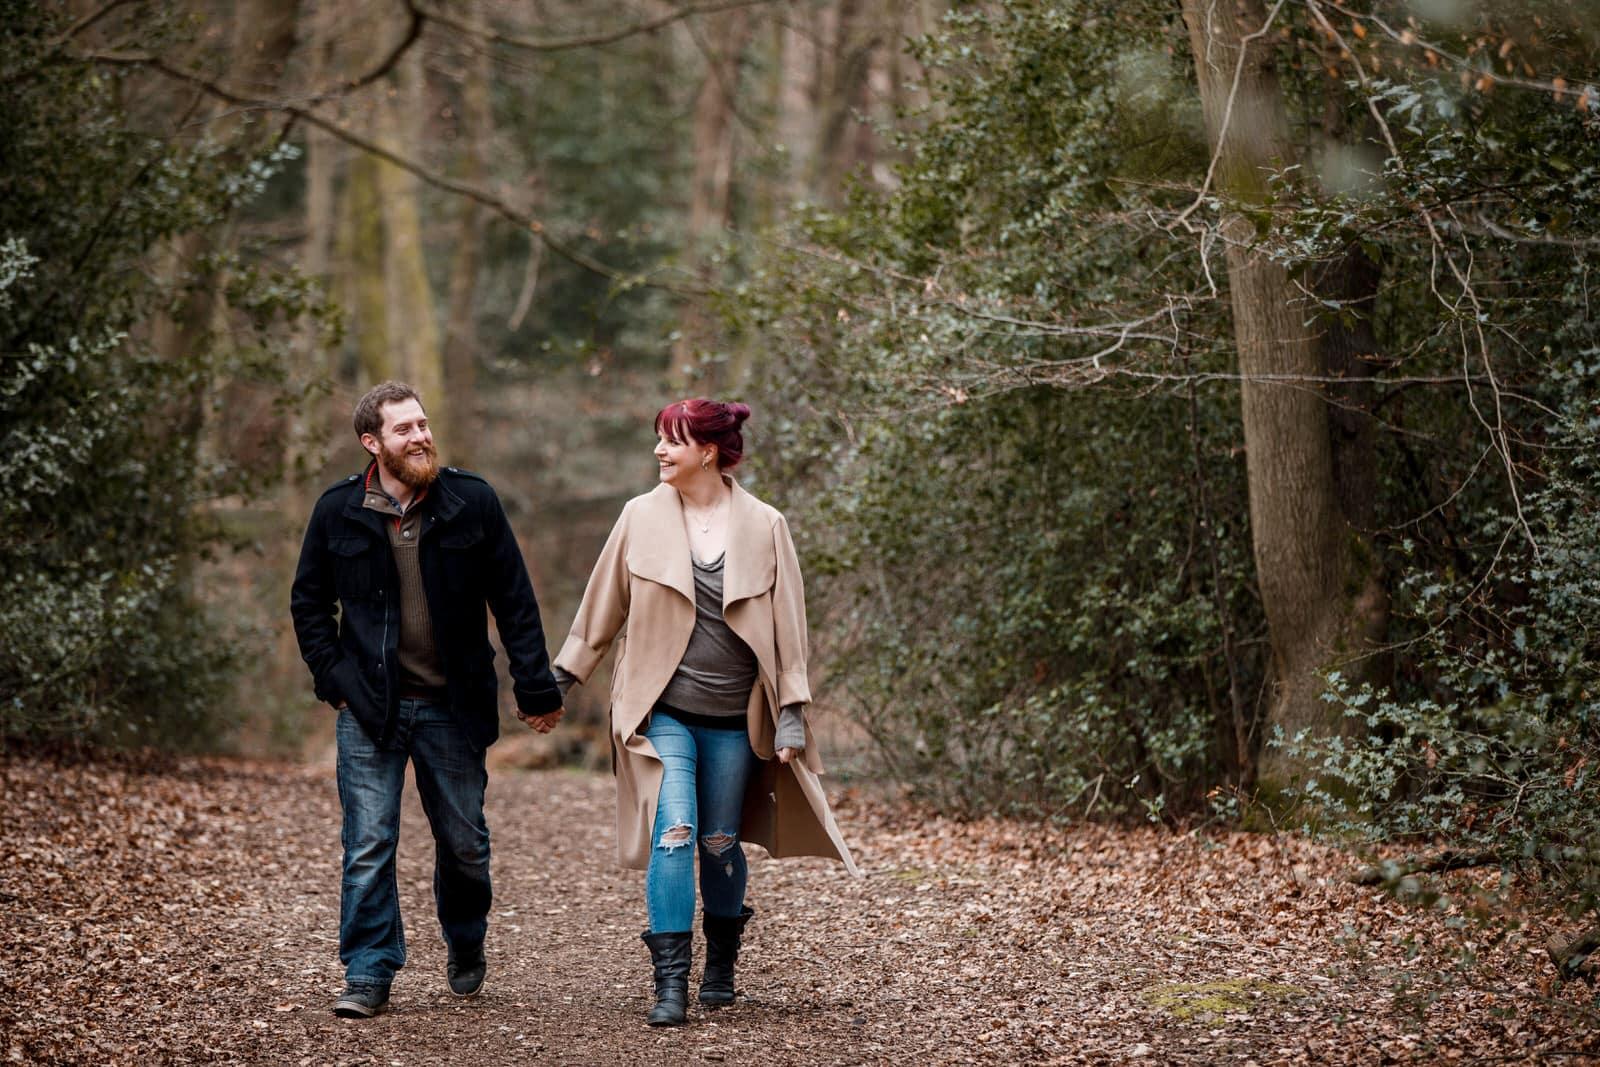 pre-wedding photography in Burnham Beeches